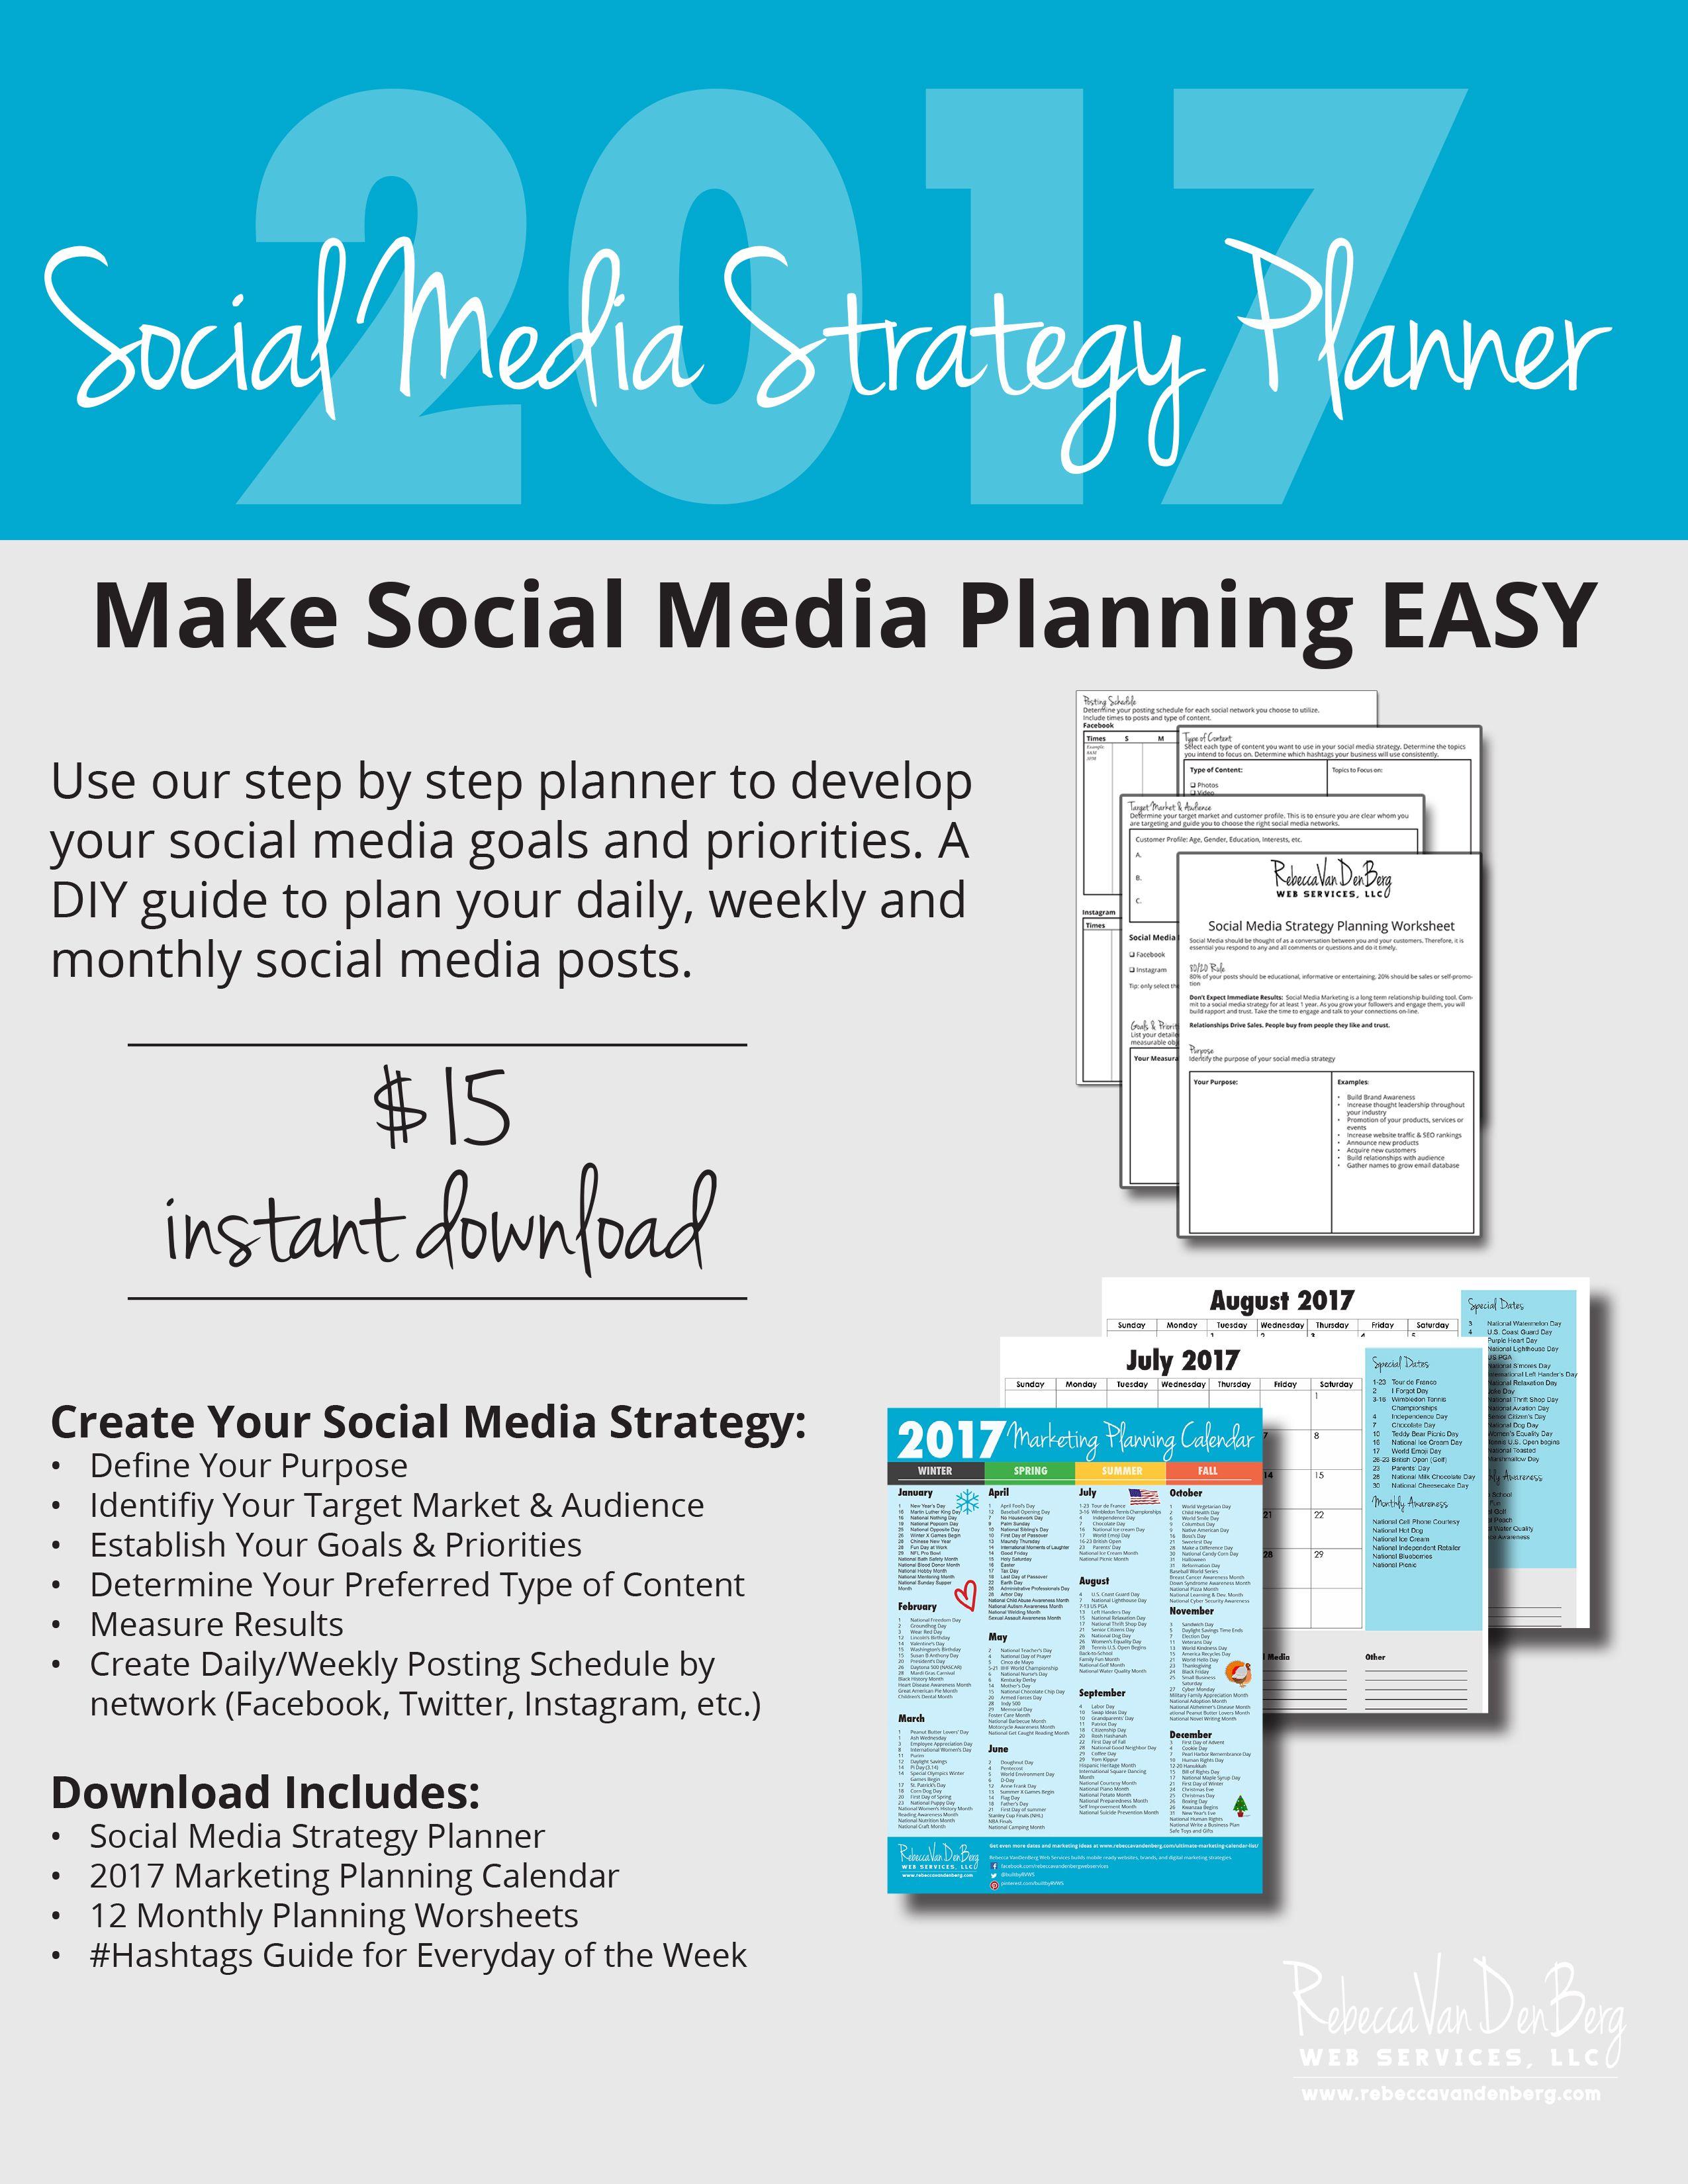 Social Media Strategy Planner